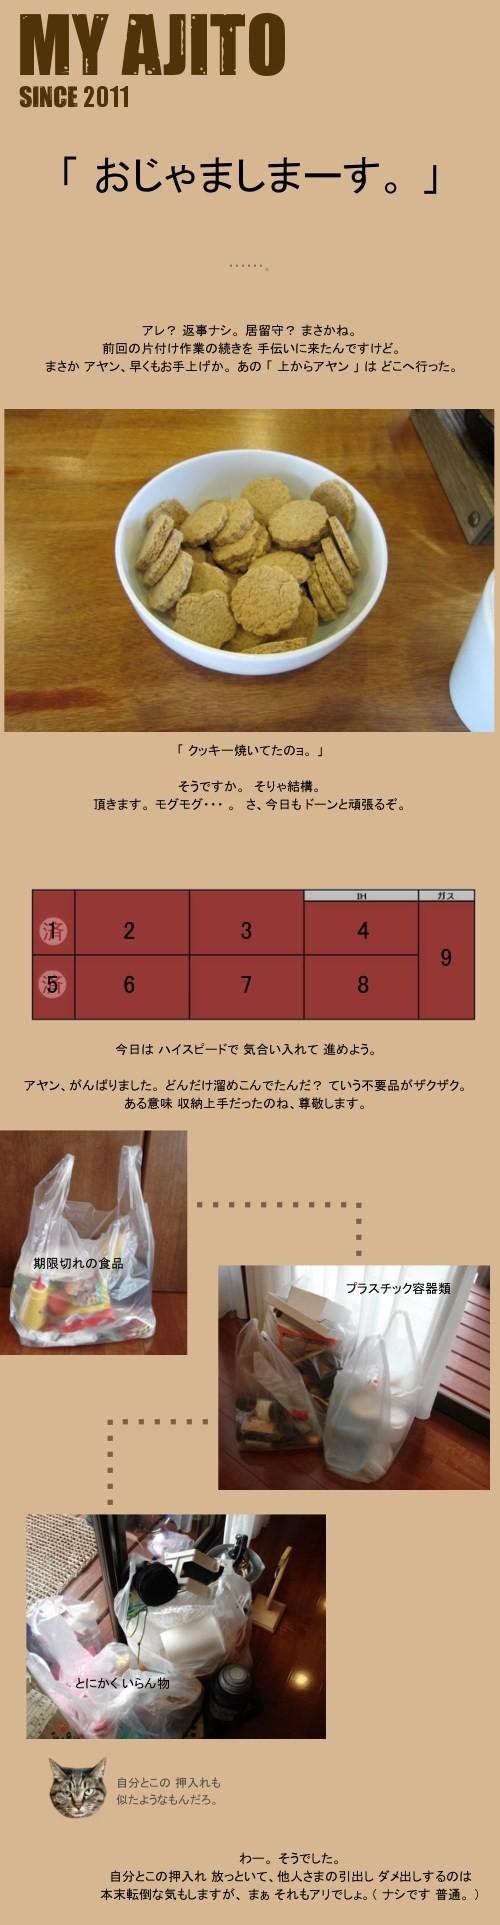 ayan_2nd_1.jpg